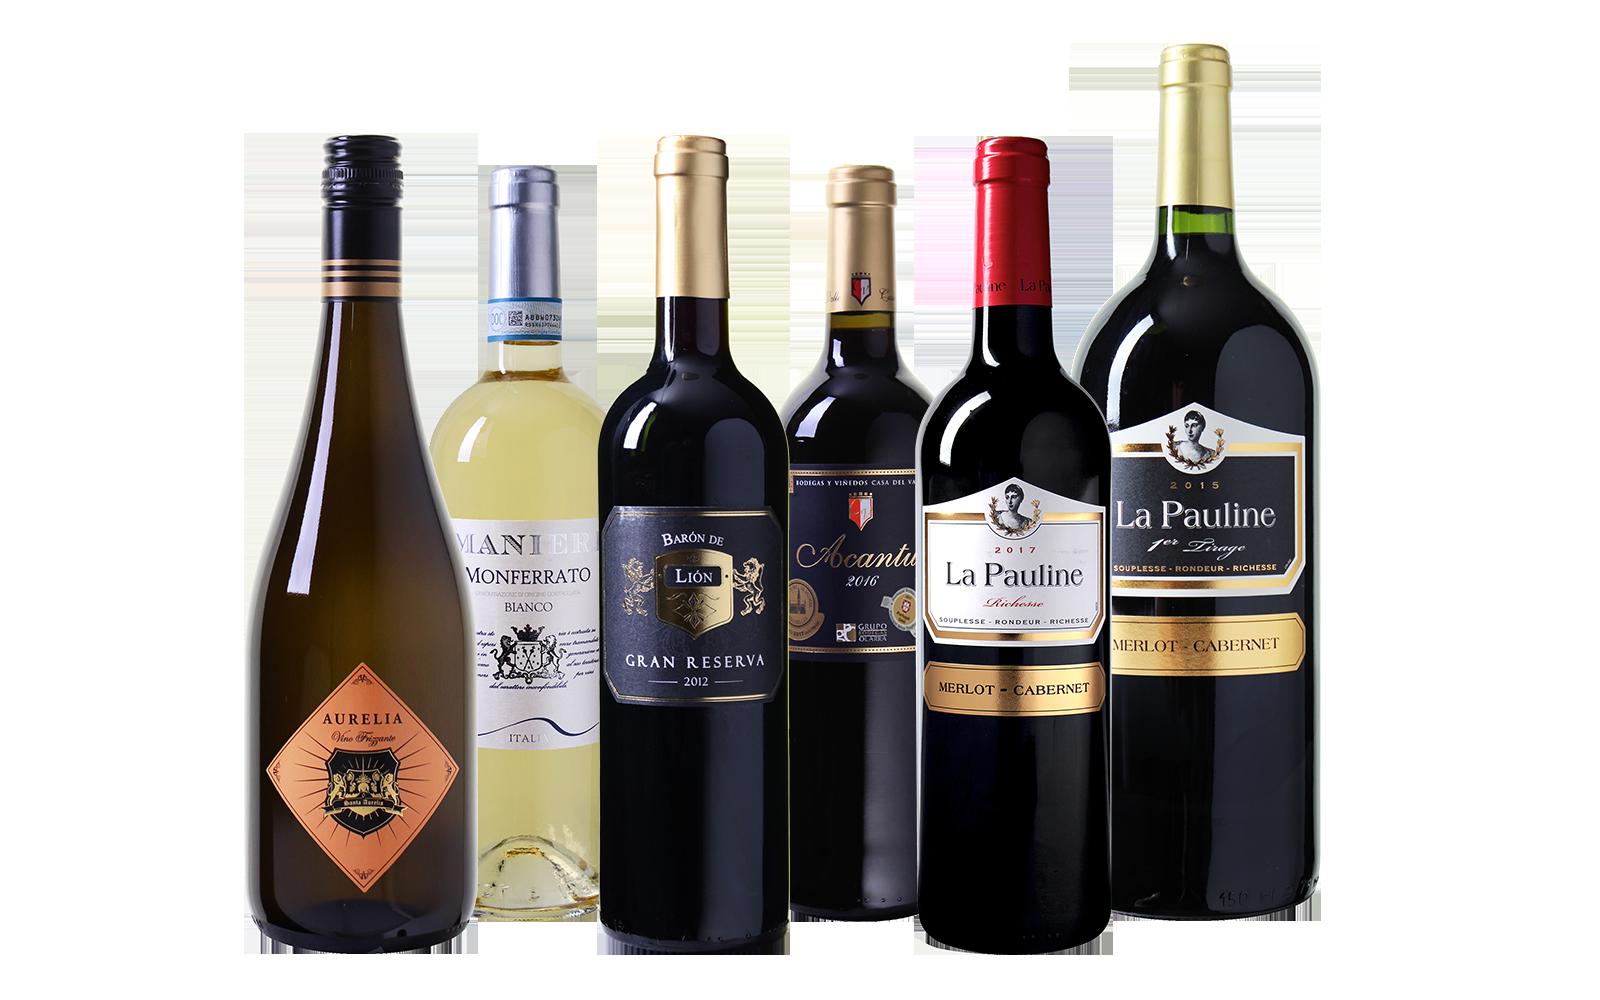 Sterrenparade Wijnpakket + Magnum